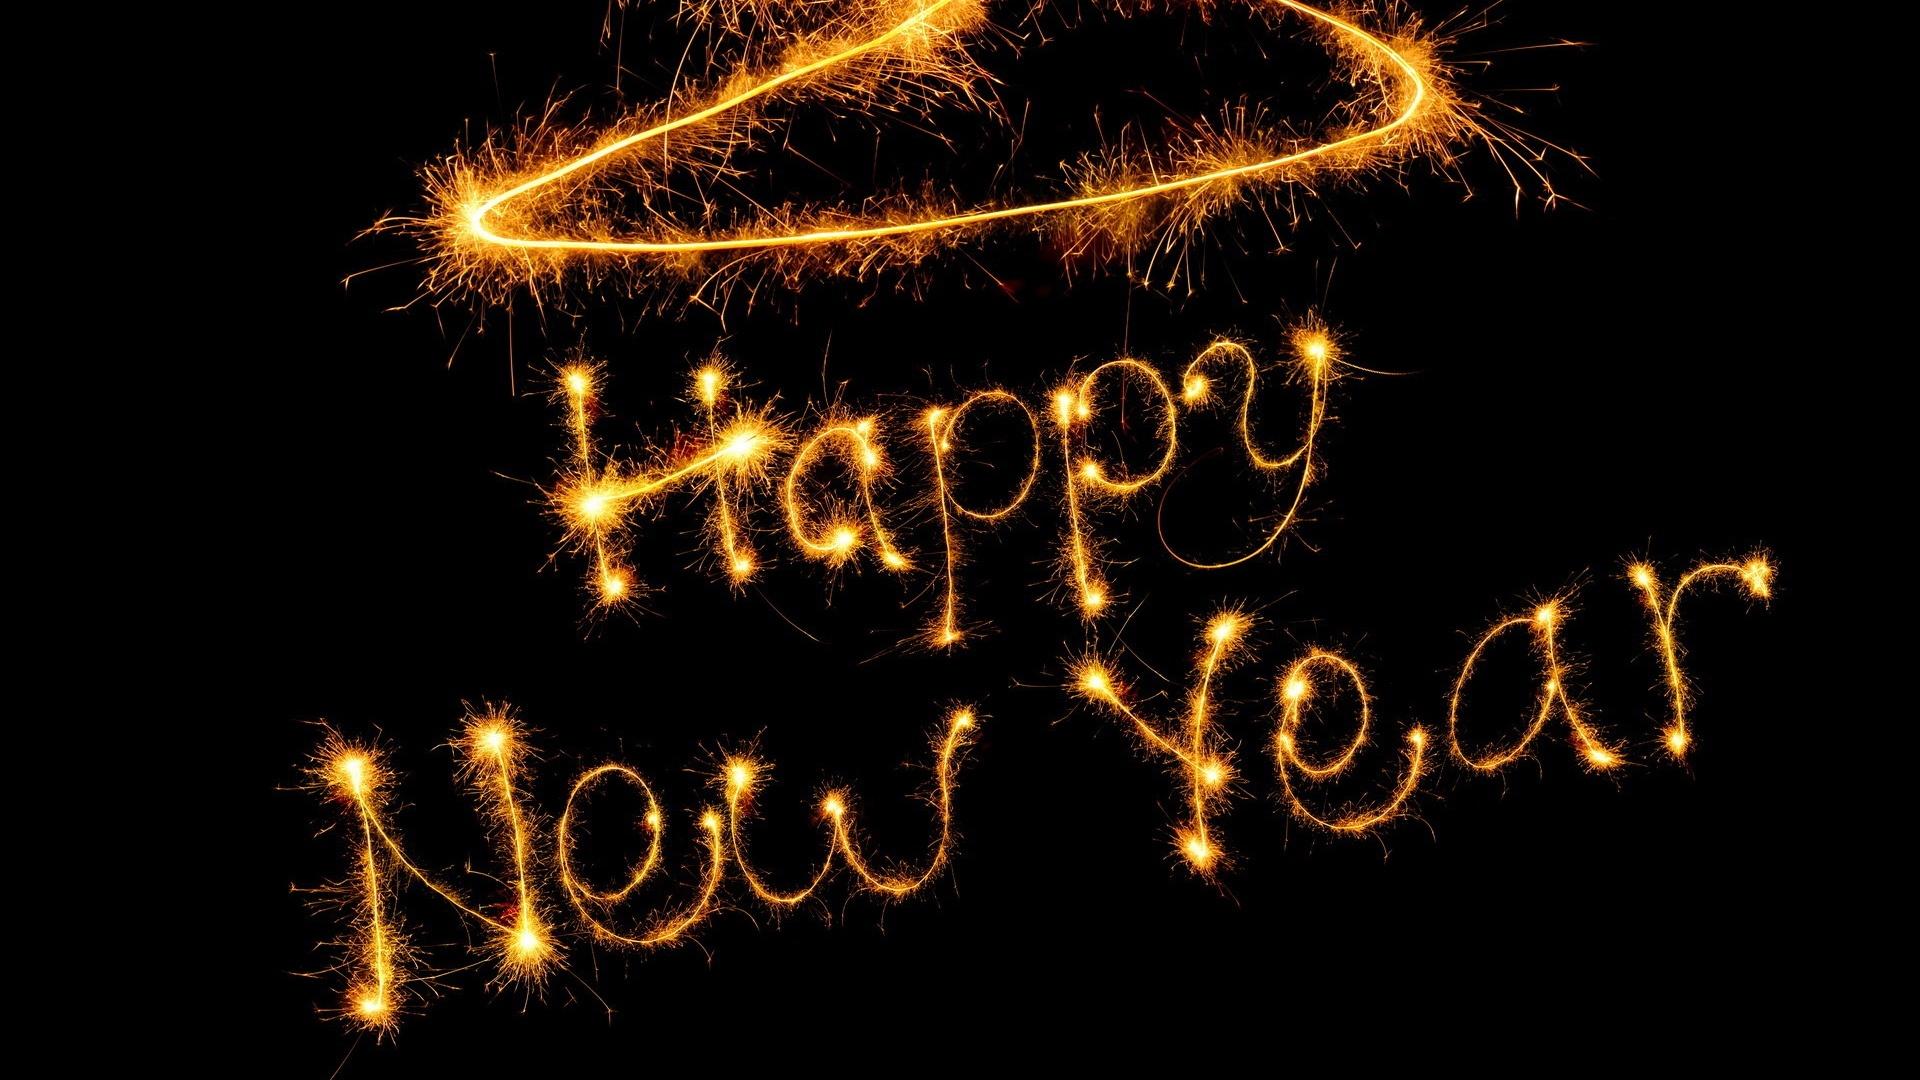 2014: Happy New Year